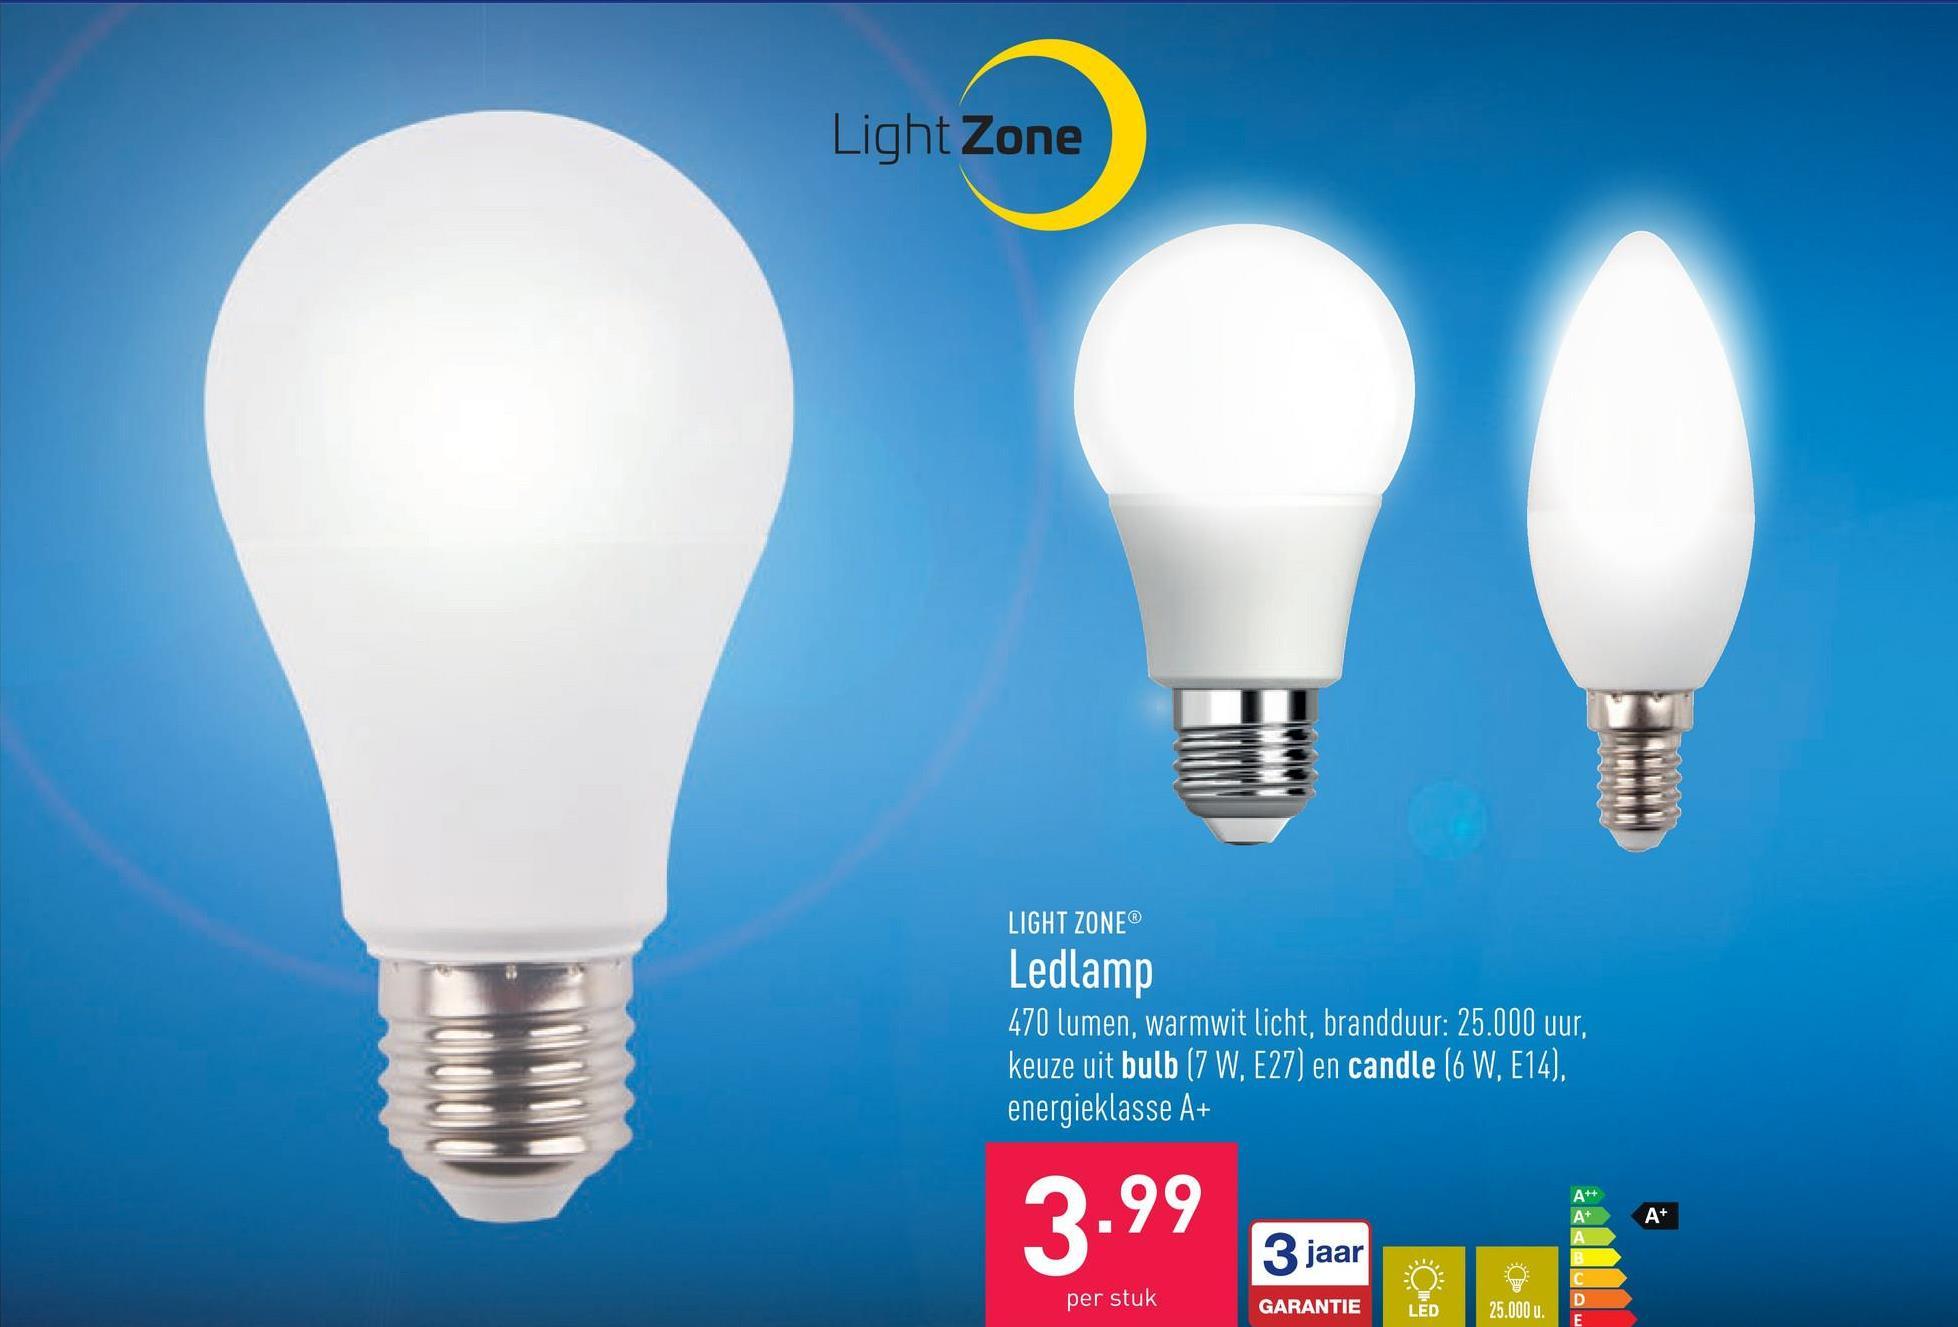 Ledlamp 470 lumen, warmwit licht, brandduur: 25.000 uur, keuze uit bulb (7 W, E27) en candle (6 W, E14), energieklasse A+